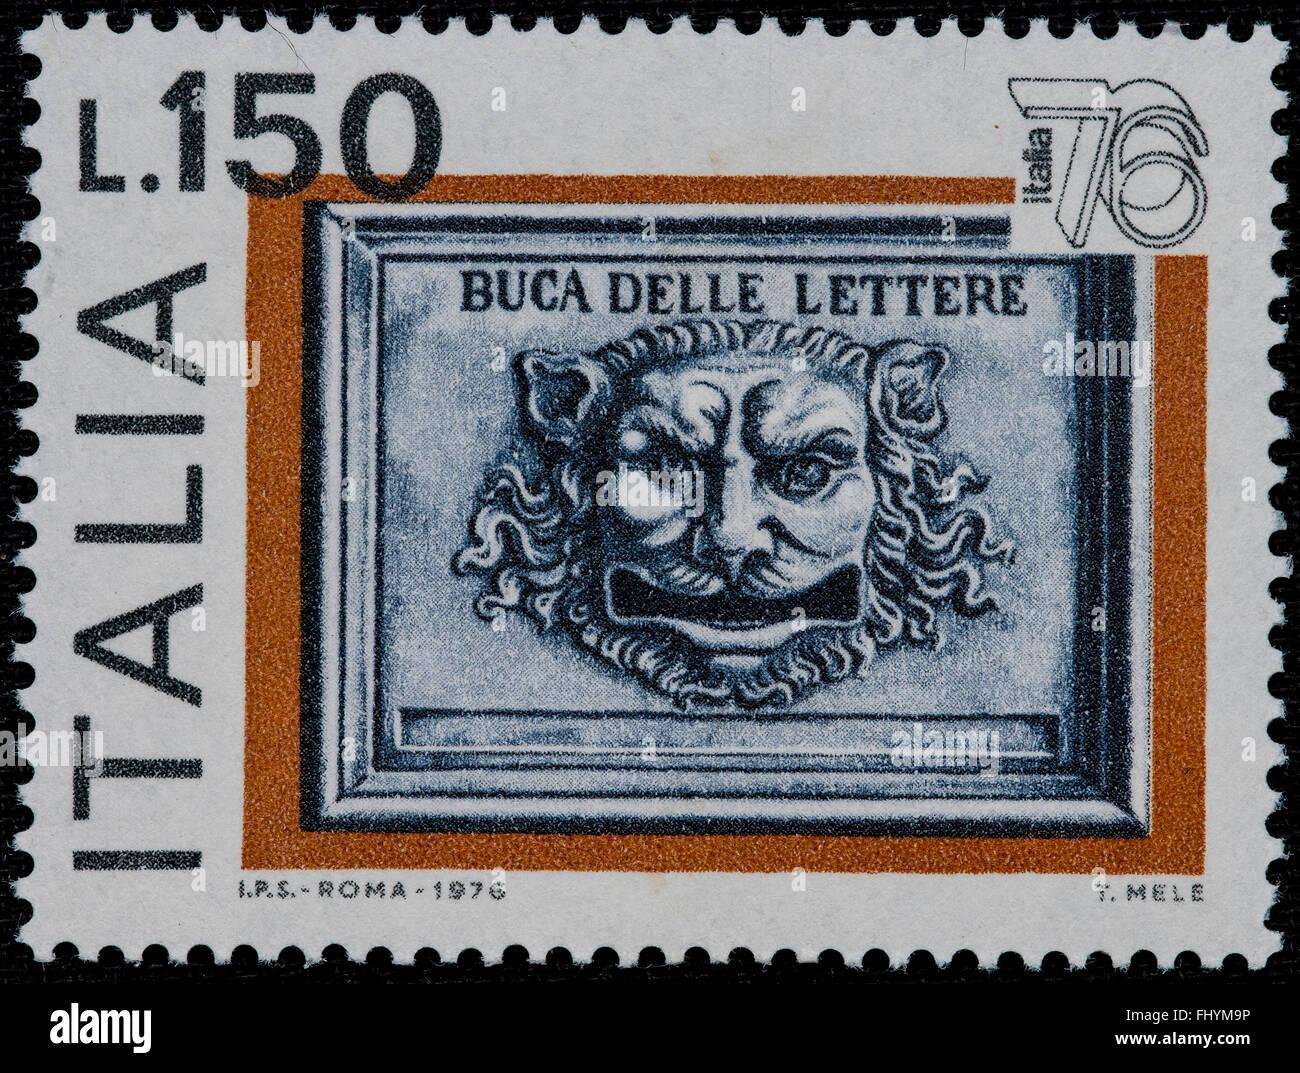 1976 Italian mint stamp issued to celebrate Italia 76 philatelic expo Lire 150 - Stock Image